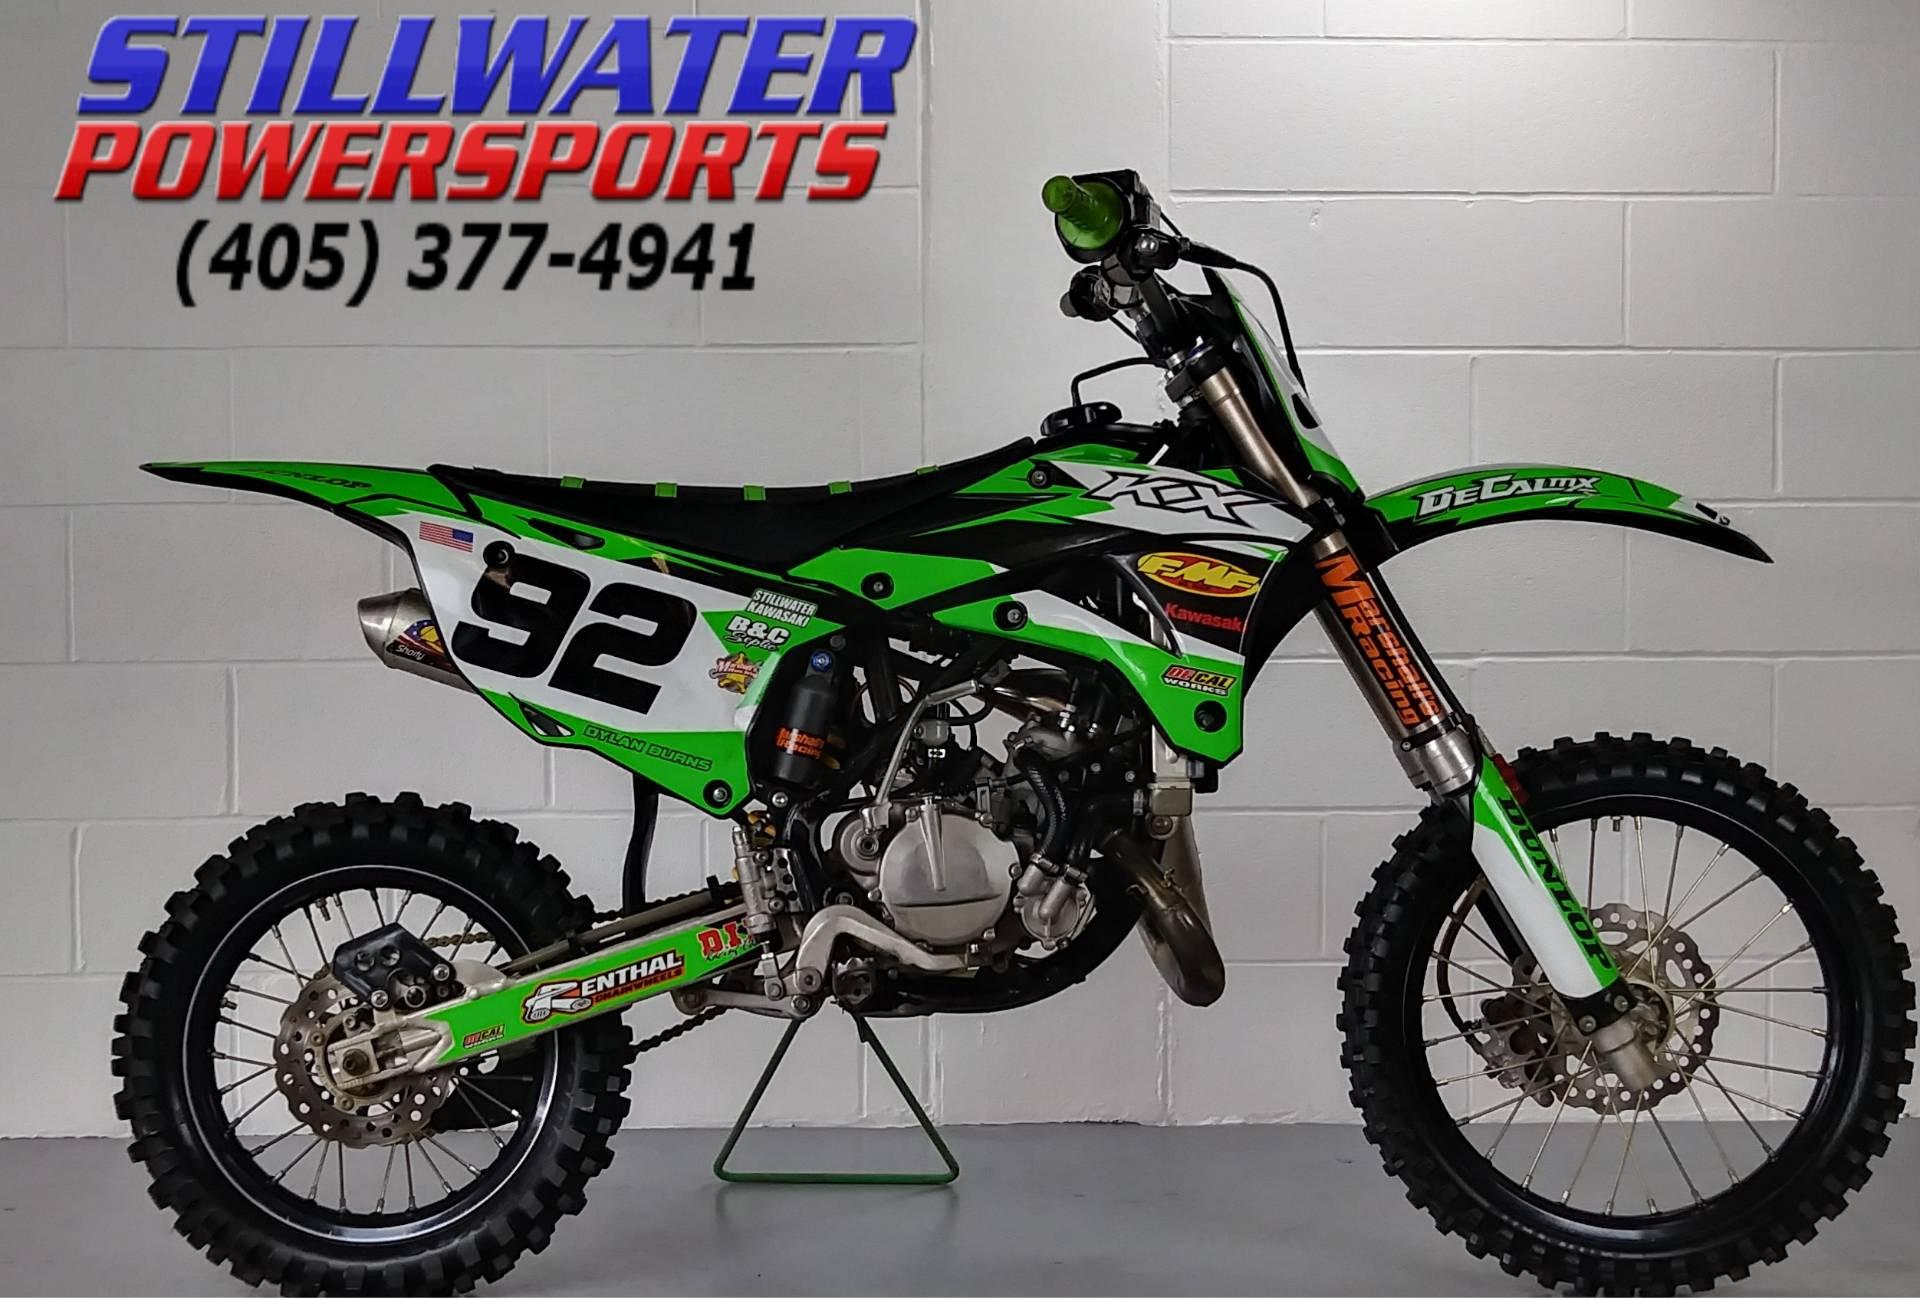 Used 2014 Kawasaki Kx85 Motorcycles In Stillwater Ok Stock